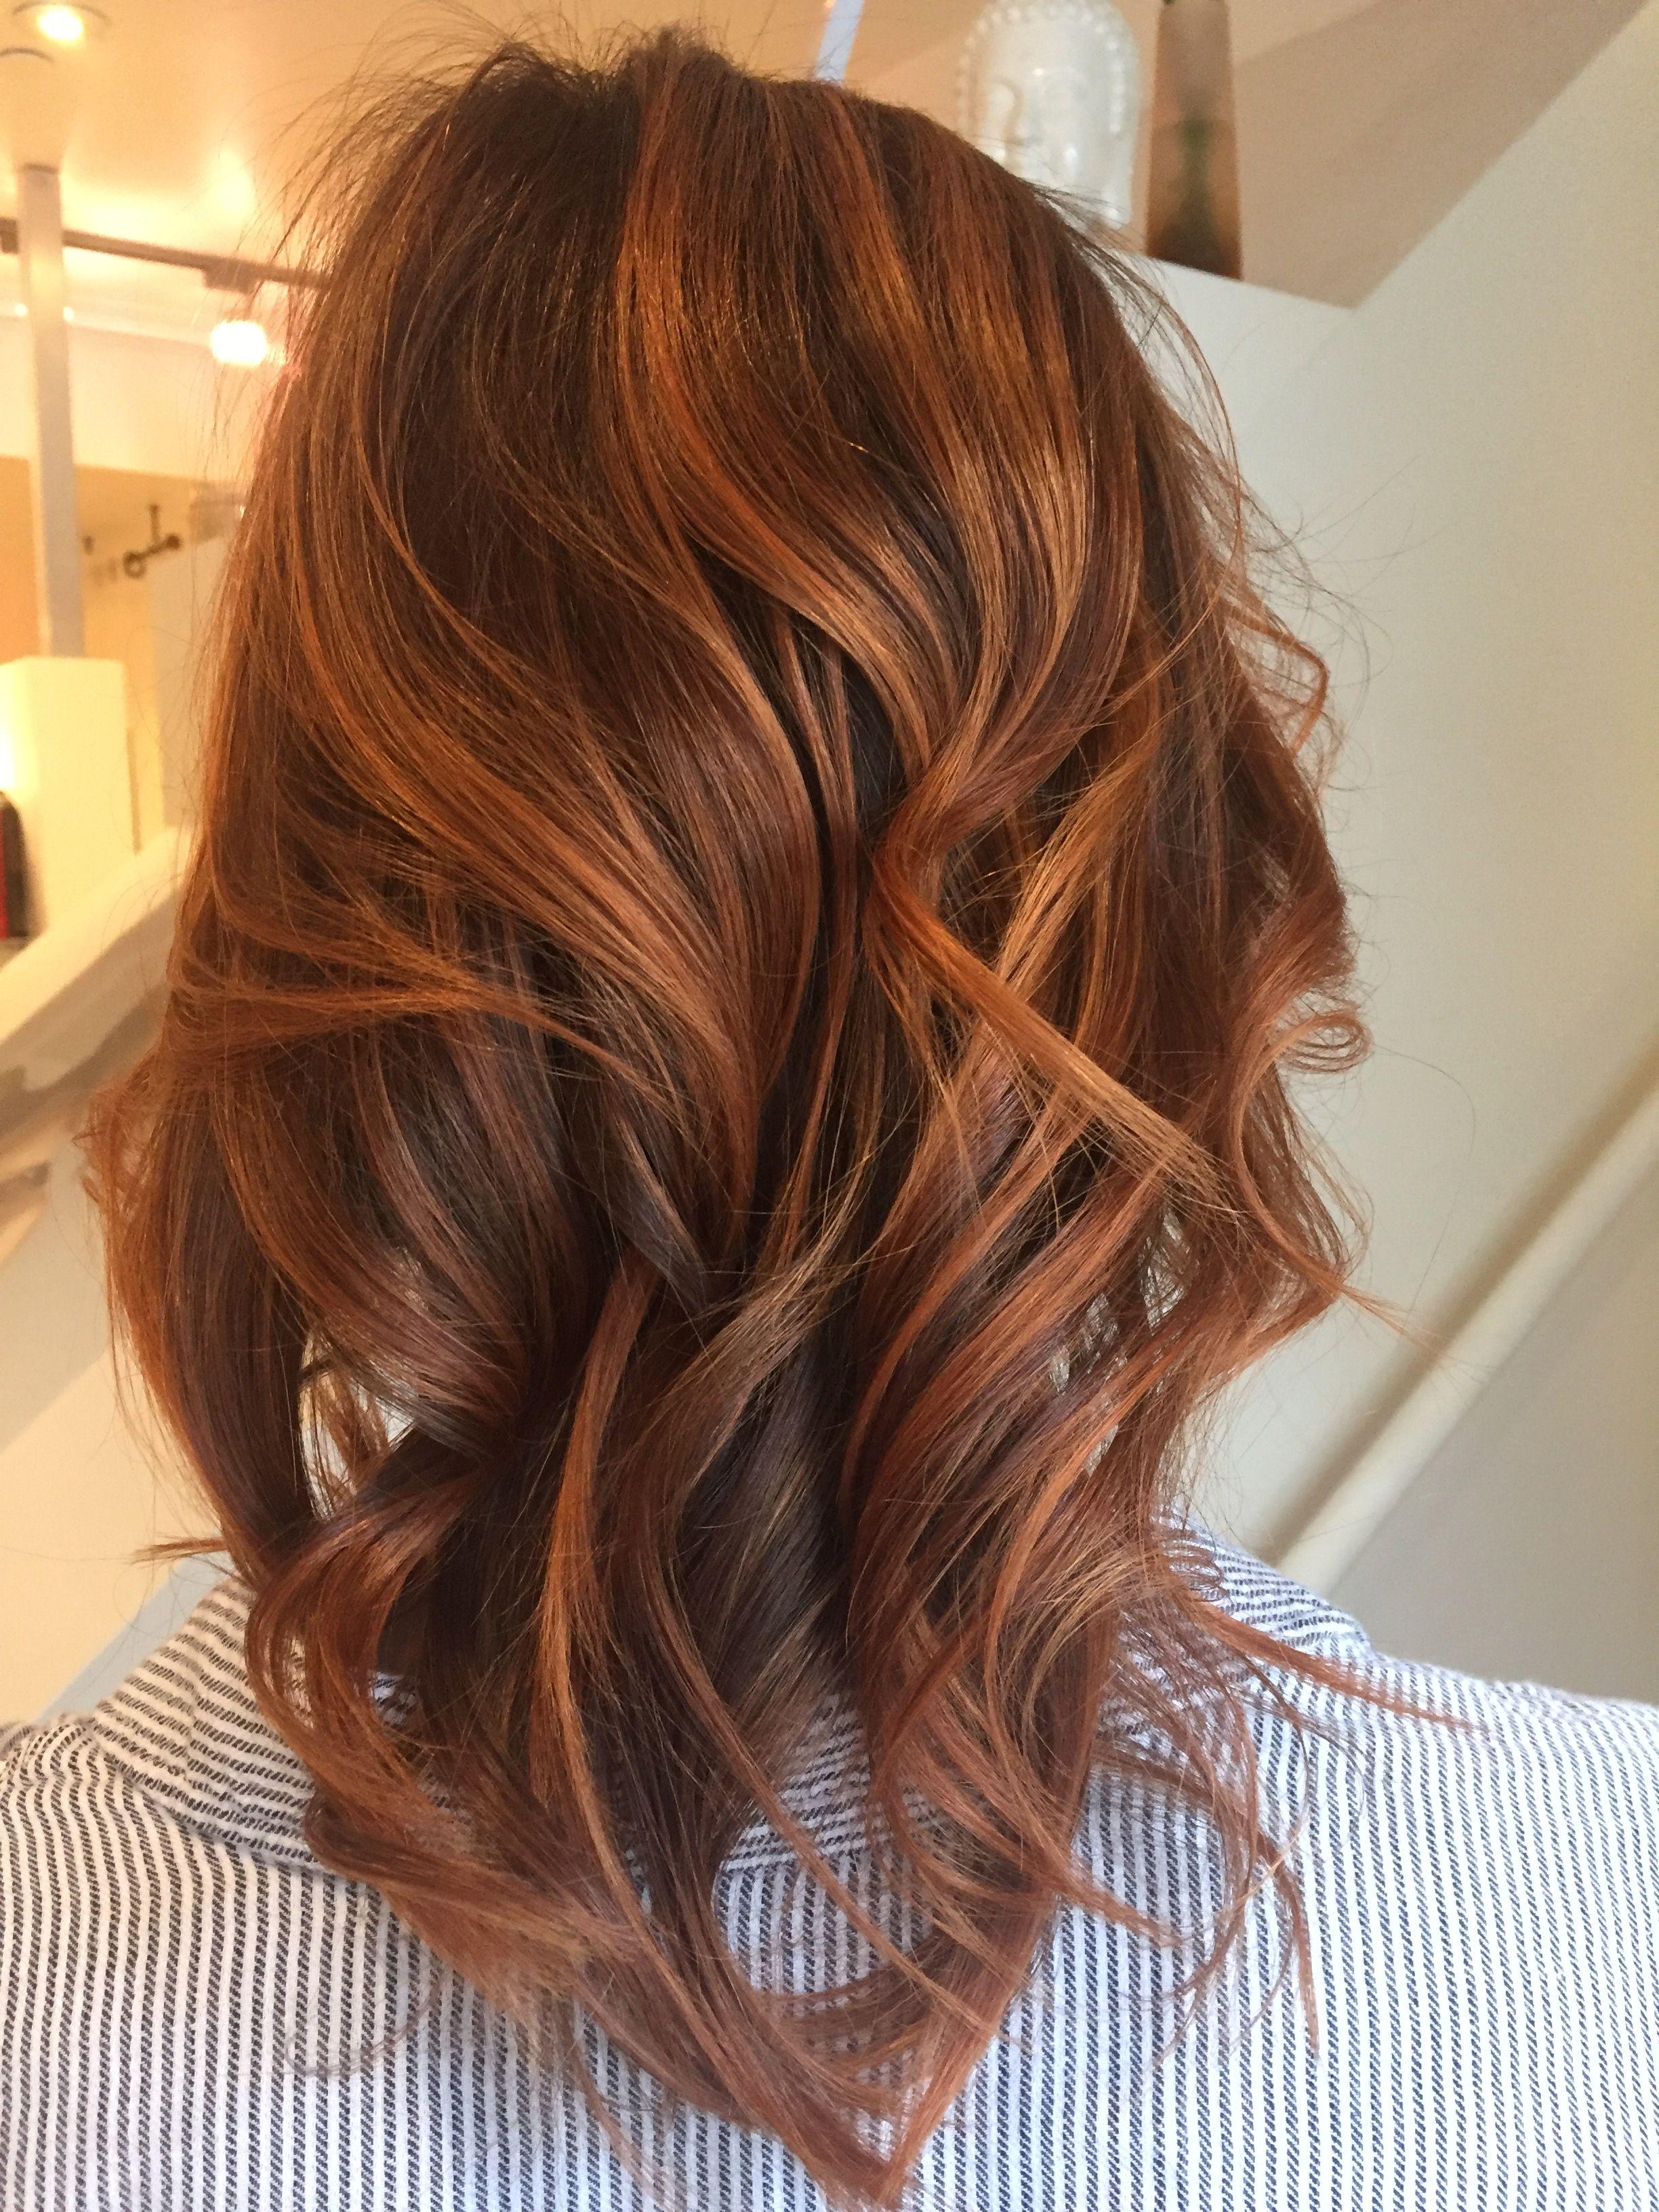 Copper Penny Hair Color Hair Color Copper Hair Color Copper Brown Hair Color